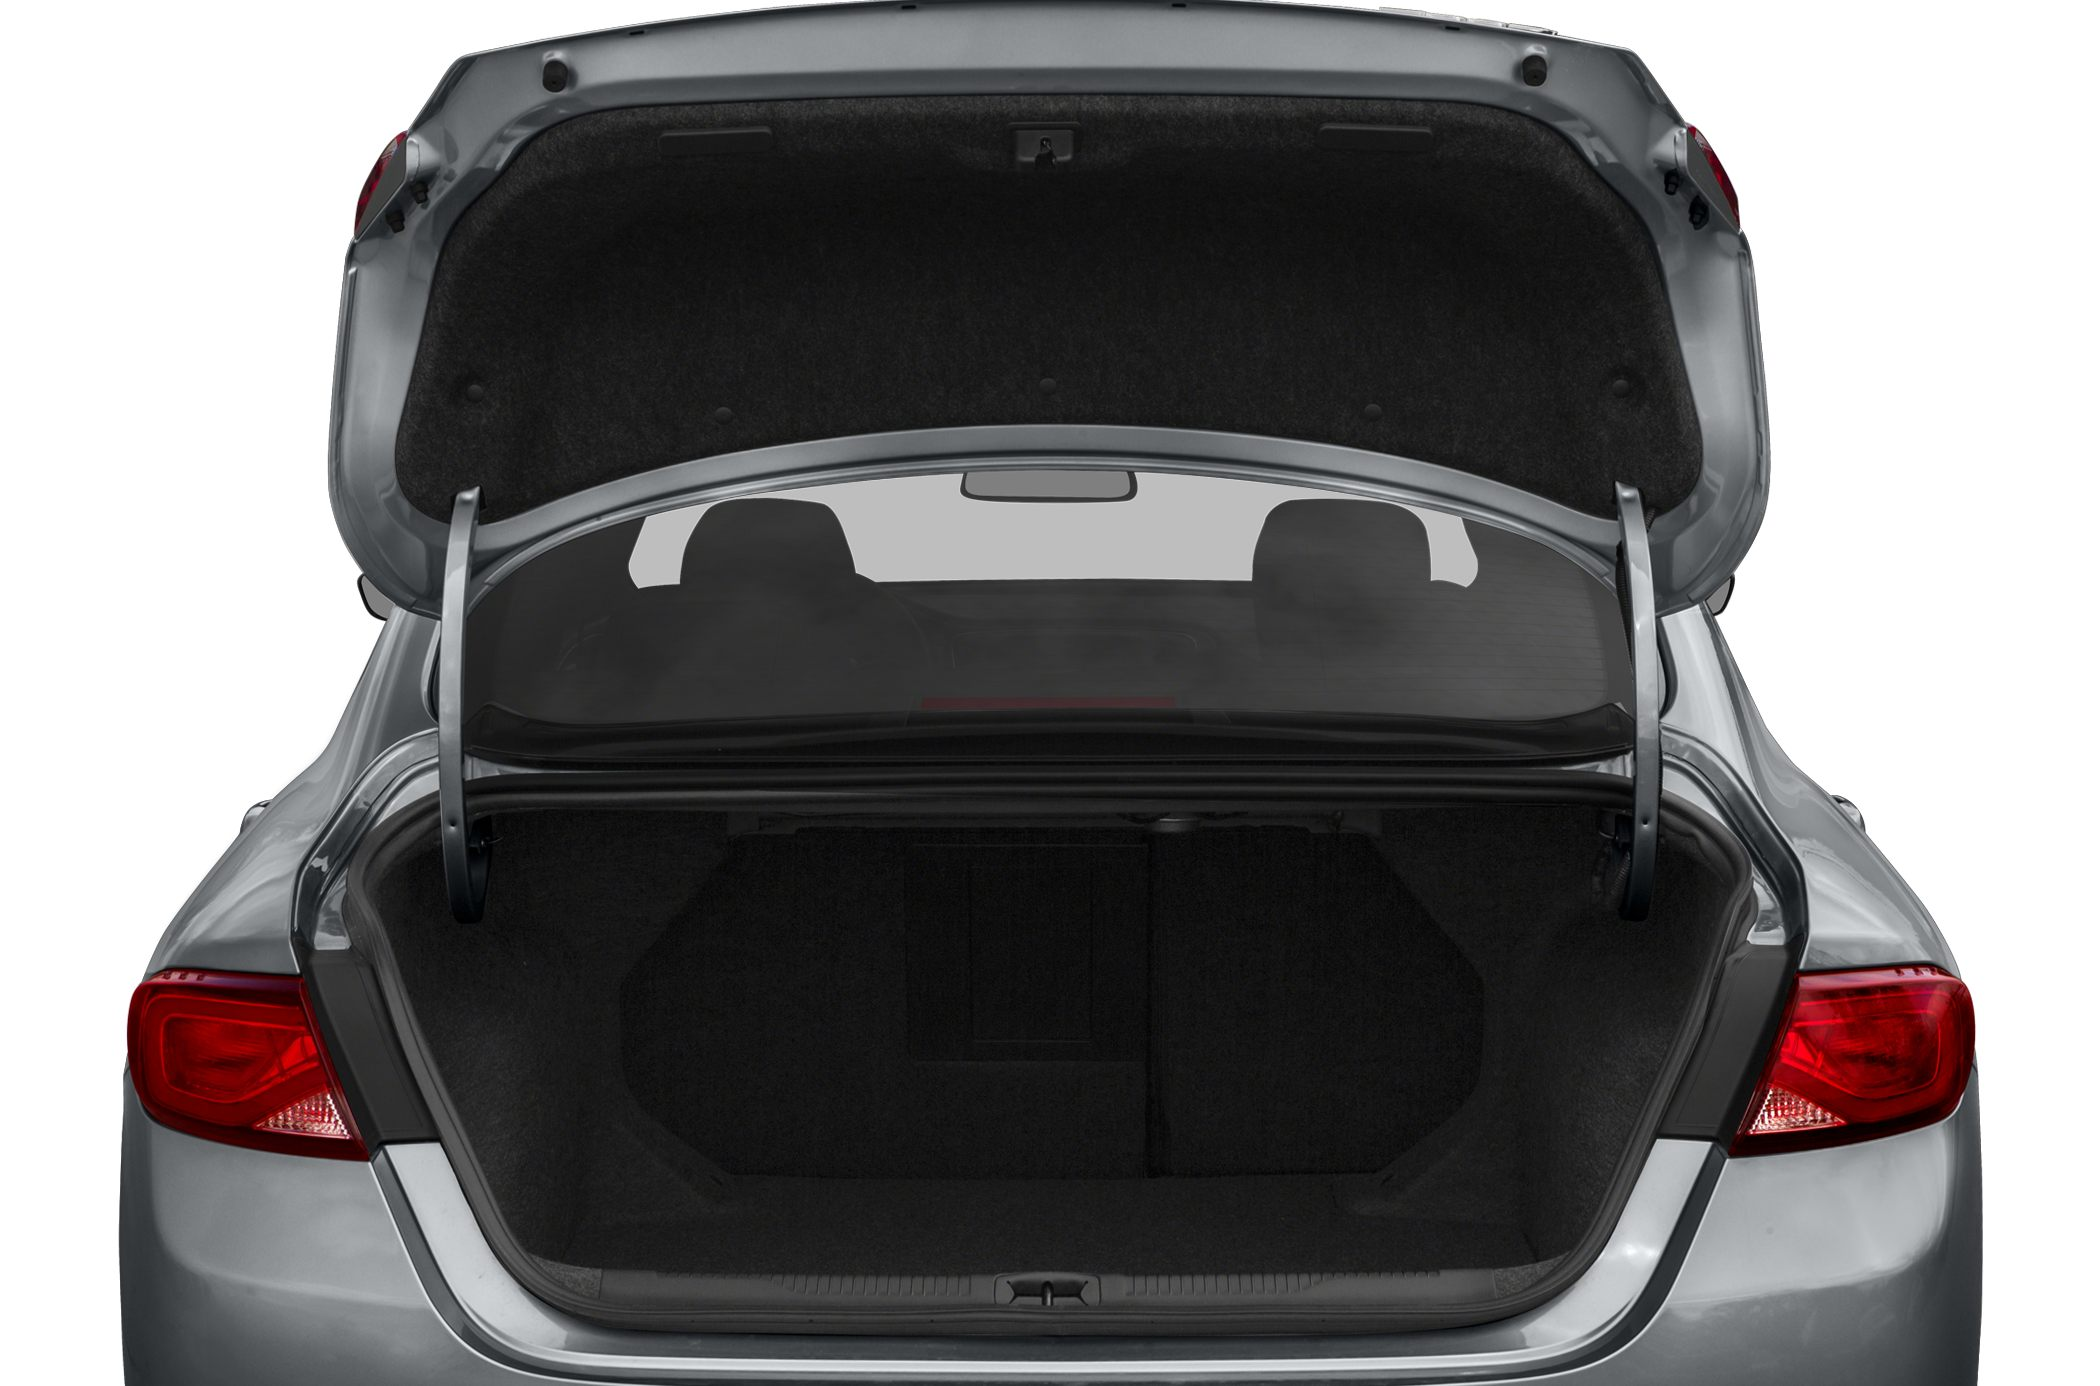 Chrysler 200 boot space